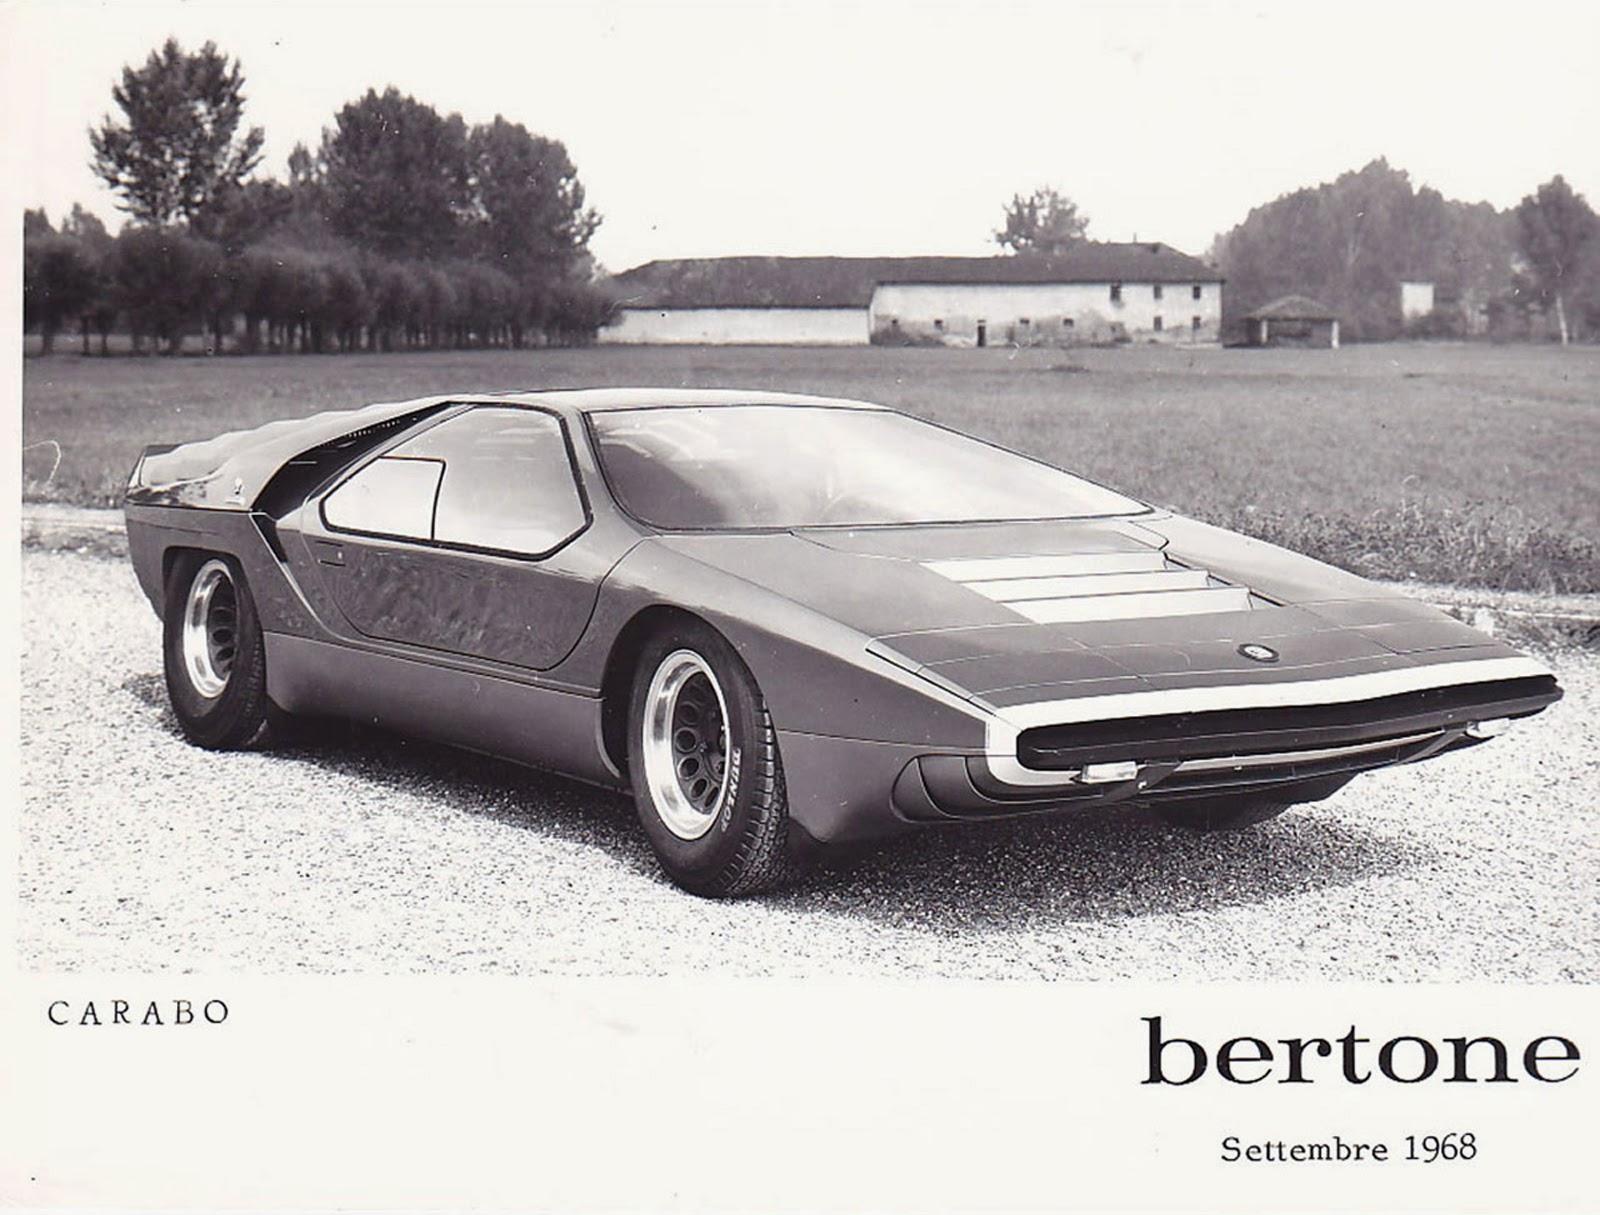 stormwheels settembre 1968 italia carrozzeria bertone alfa romeo carabo prototipo. Black Bedroom Furniture Sets. Home Design Ideas